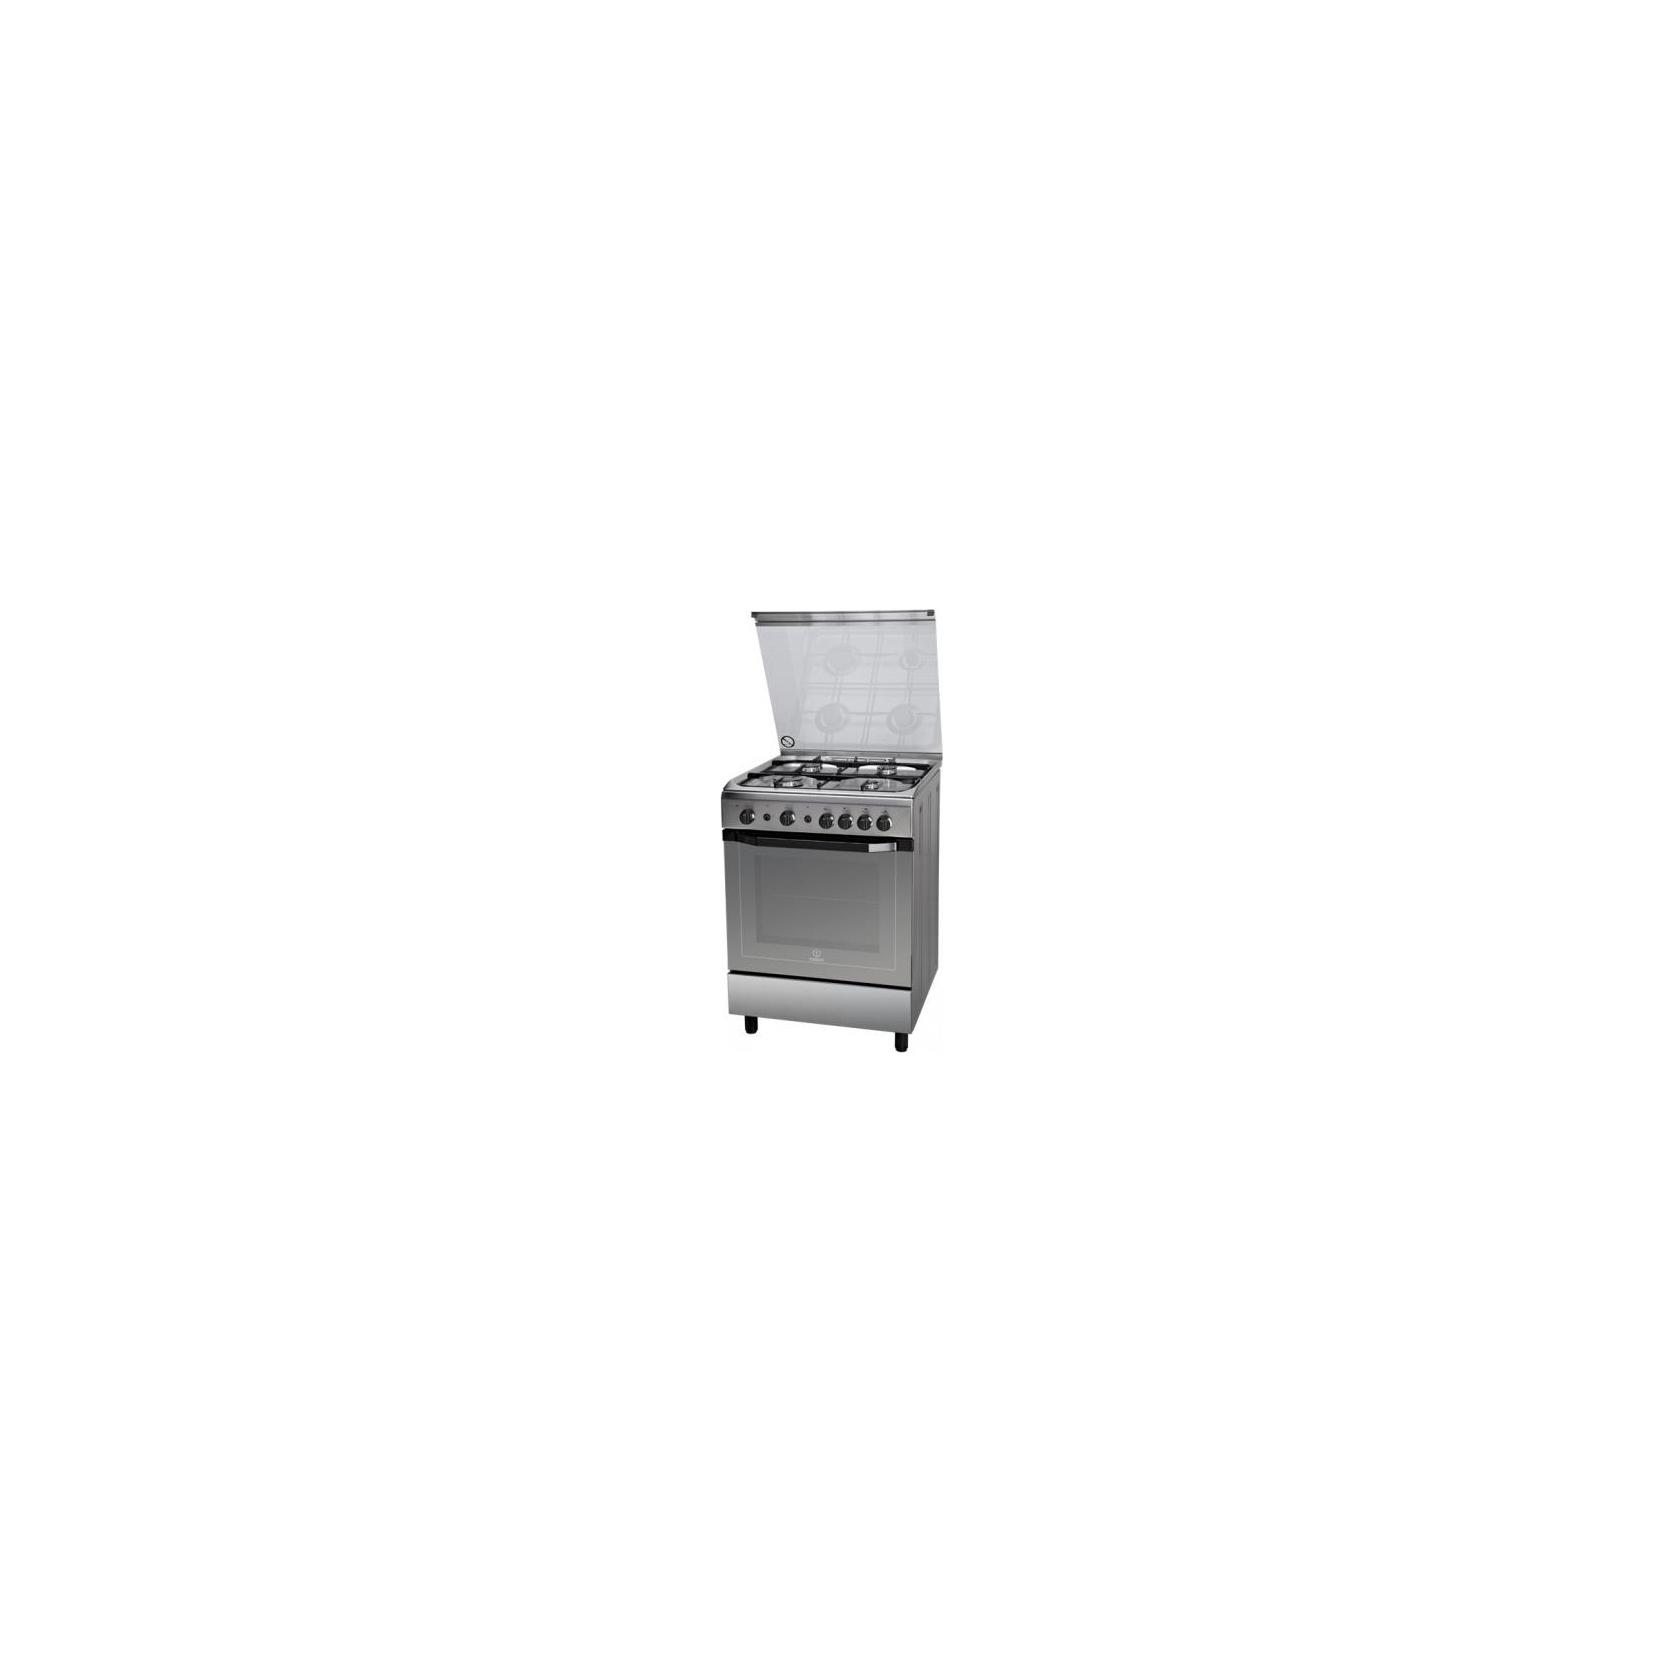 Cucina indesit i6gg1f x i inox 60x60 4 fuochi forno a gas garanzia italia elettrovillage - Cucine a gas indesit ...